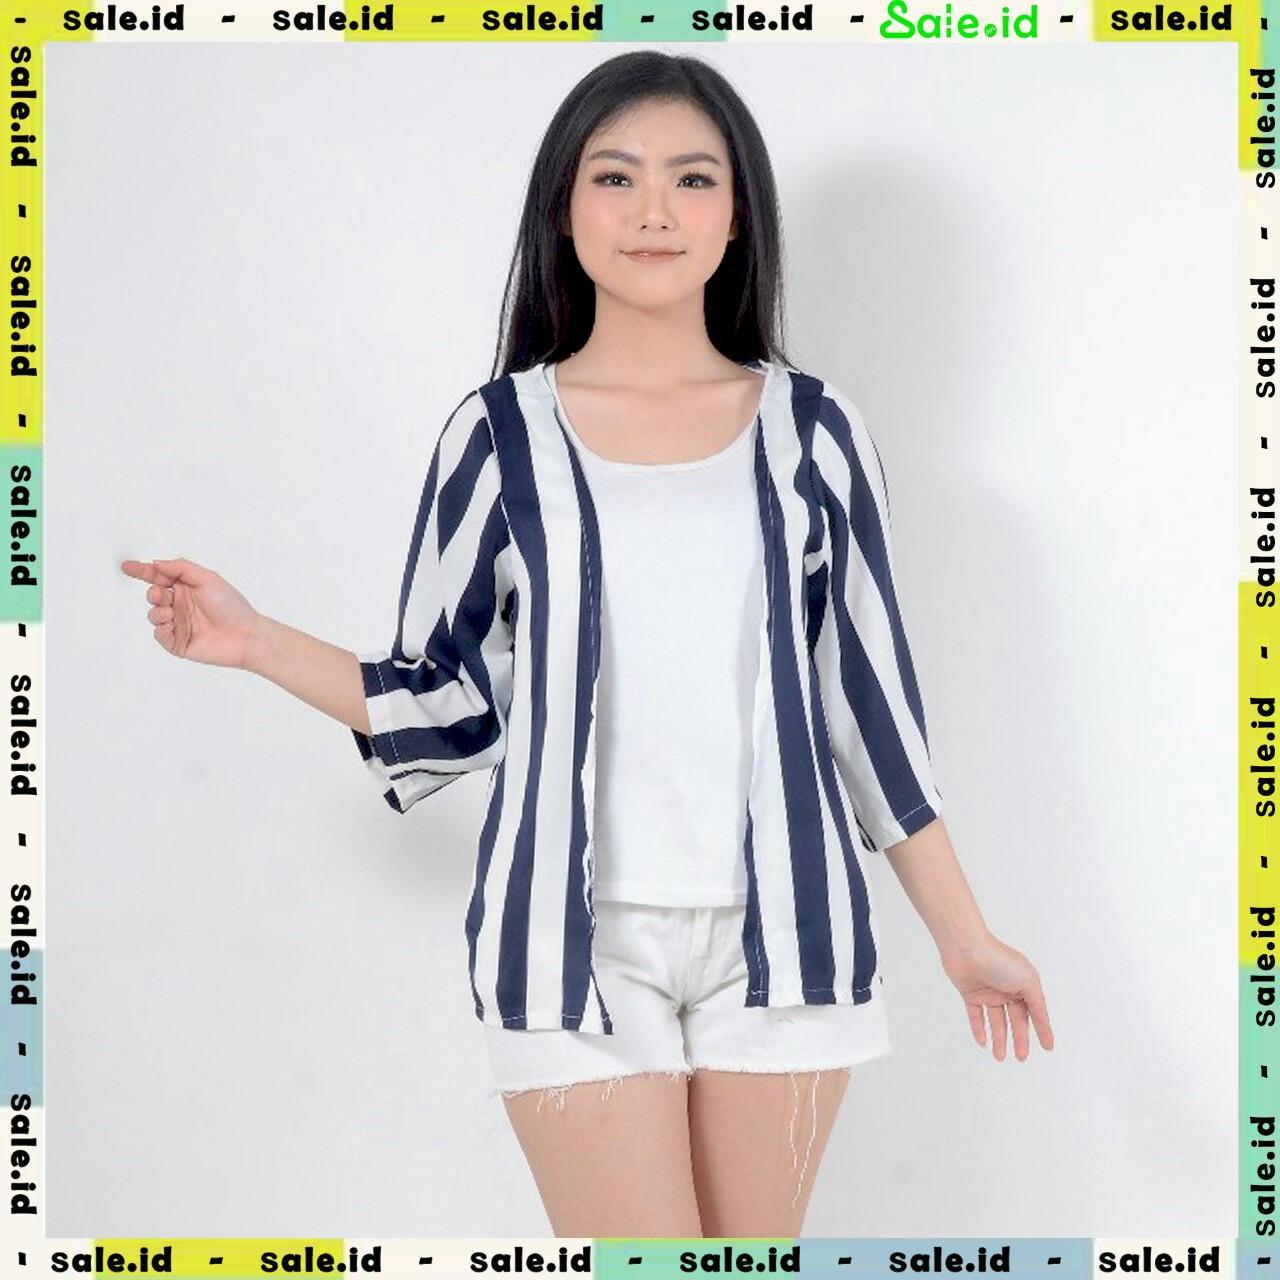 Sale.id - Outer Cotton / Luaran Katun Wanita / Motif Salur - Hitam